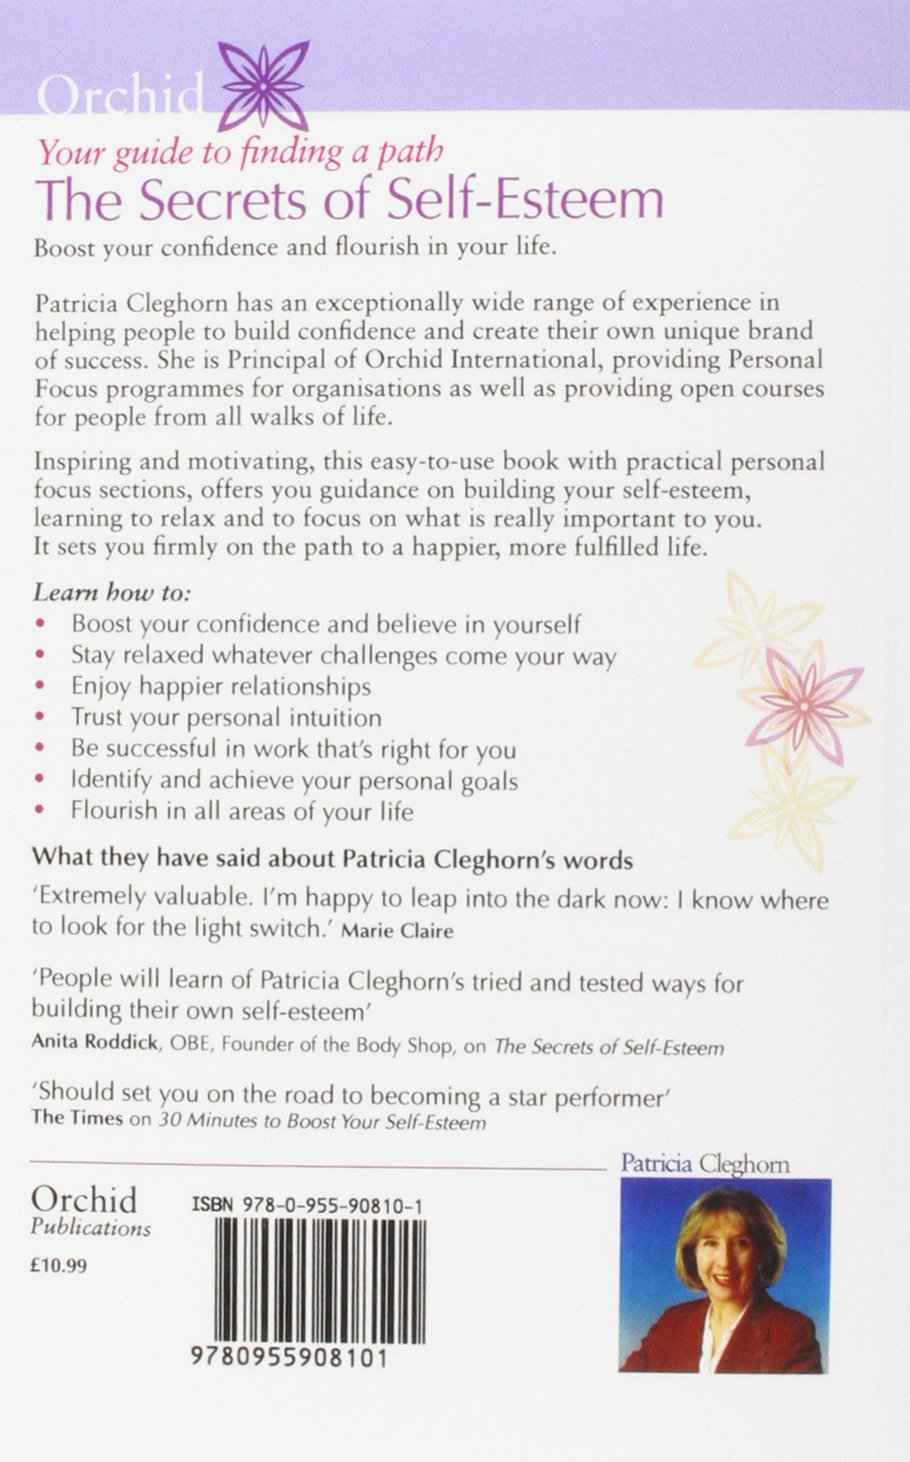 The Secrets of Self-Esteem: Amazon.co.uk: Patricia Cleghorn ...